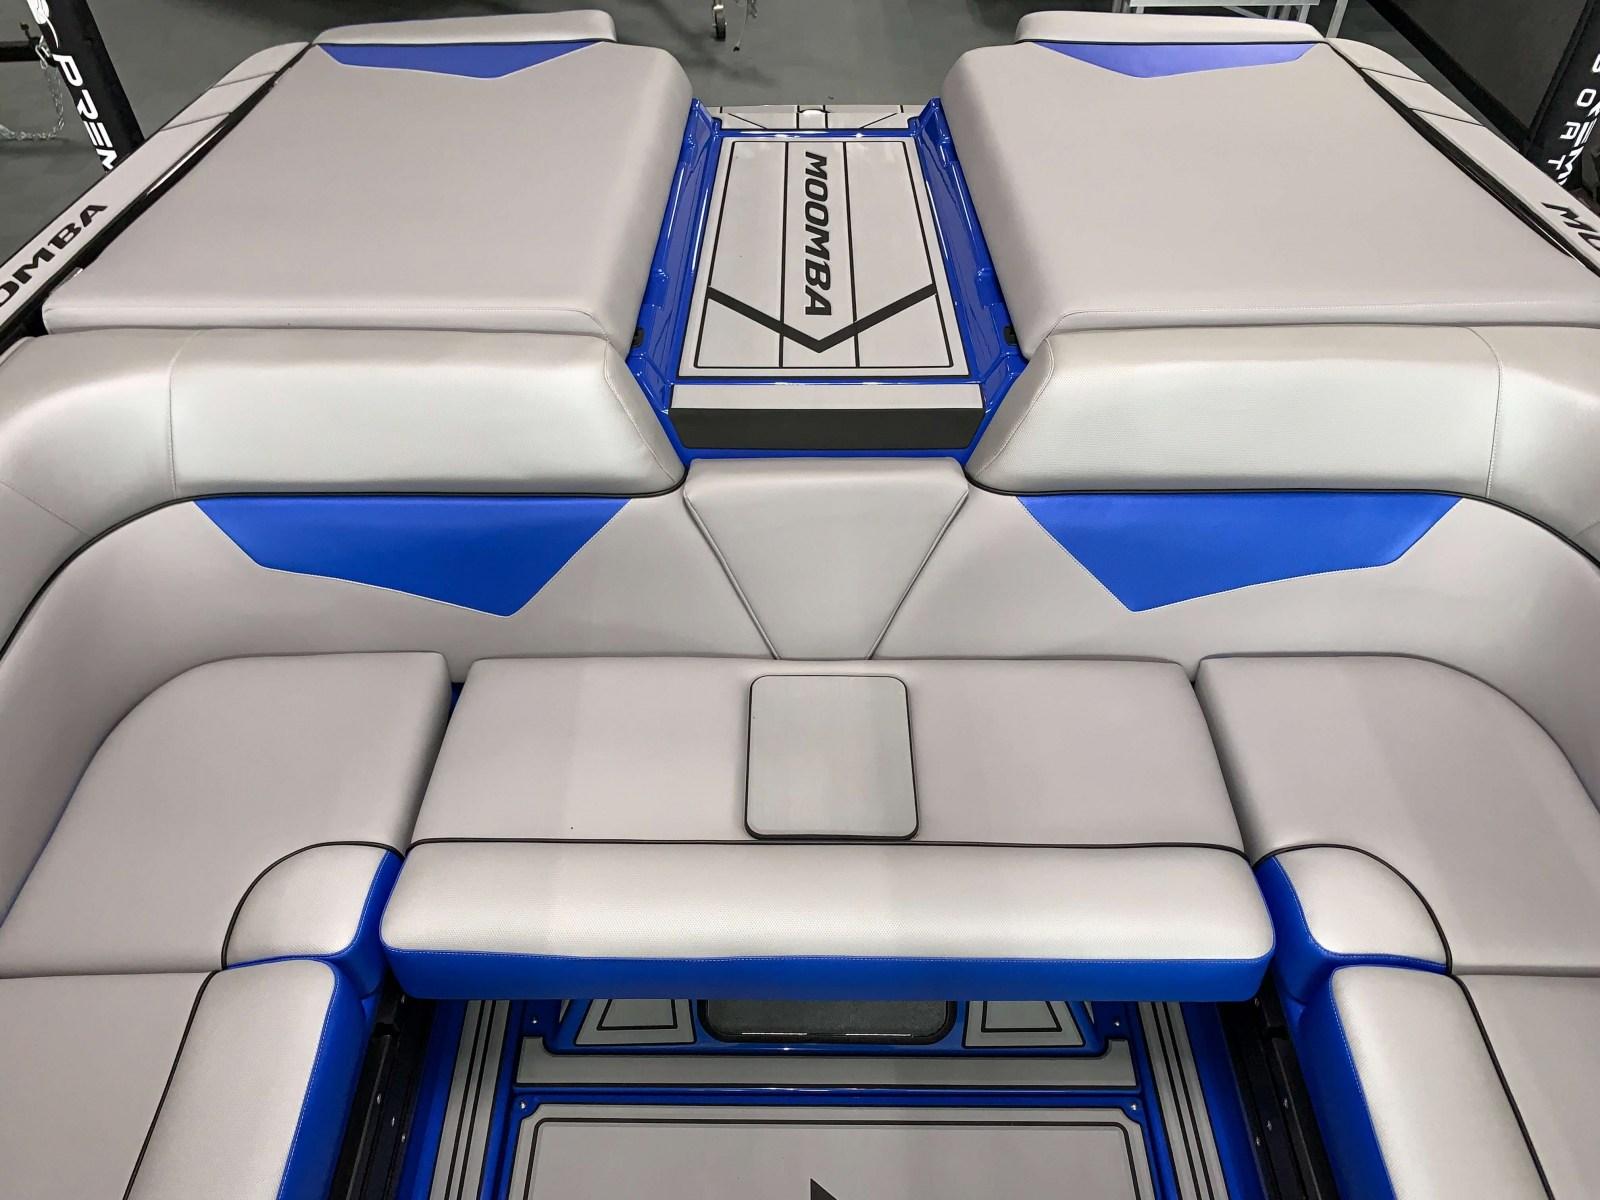 Transom Walk-Thru Design of the 2021 Moomba Kaiyen Wake Boat